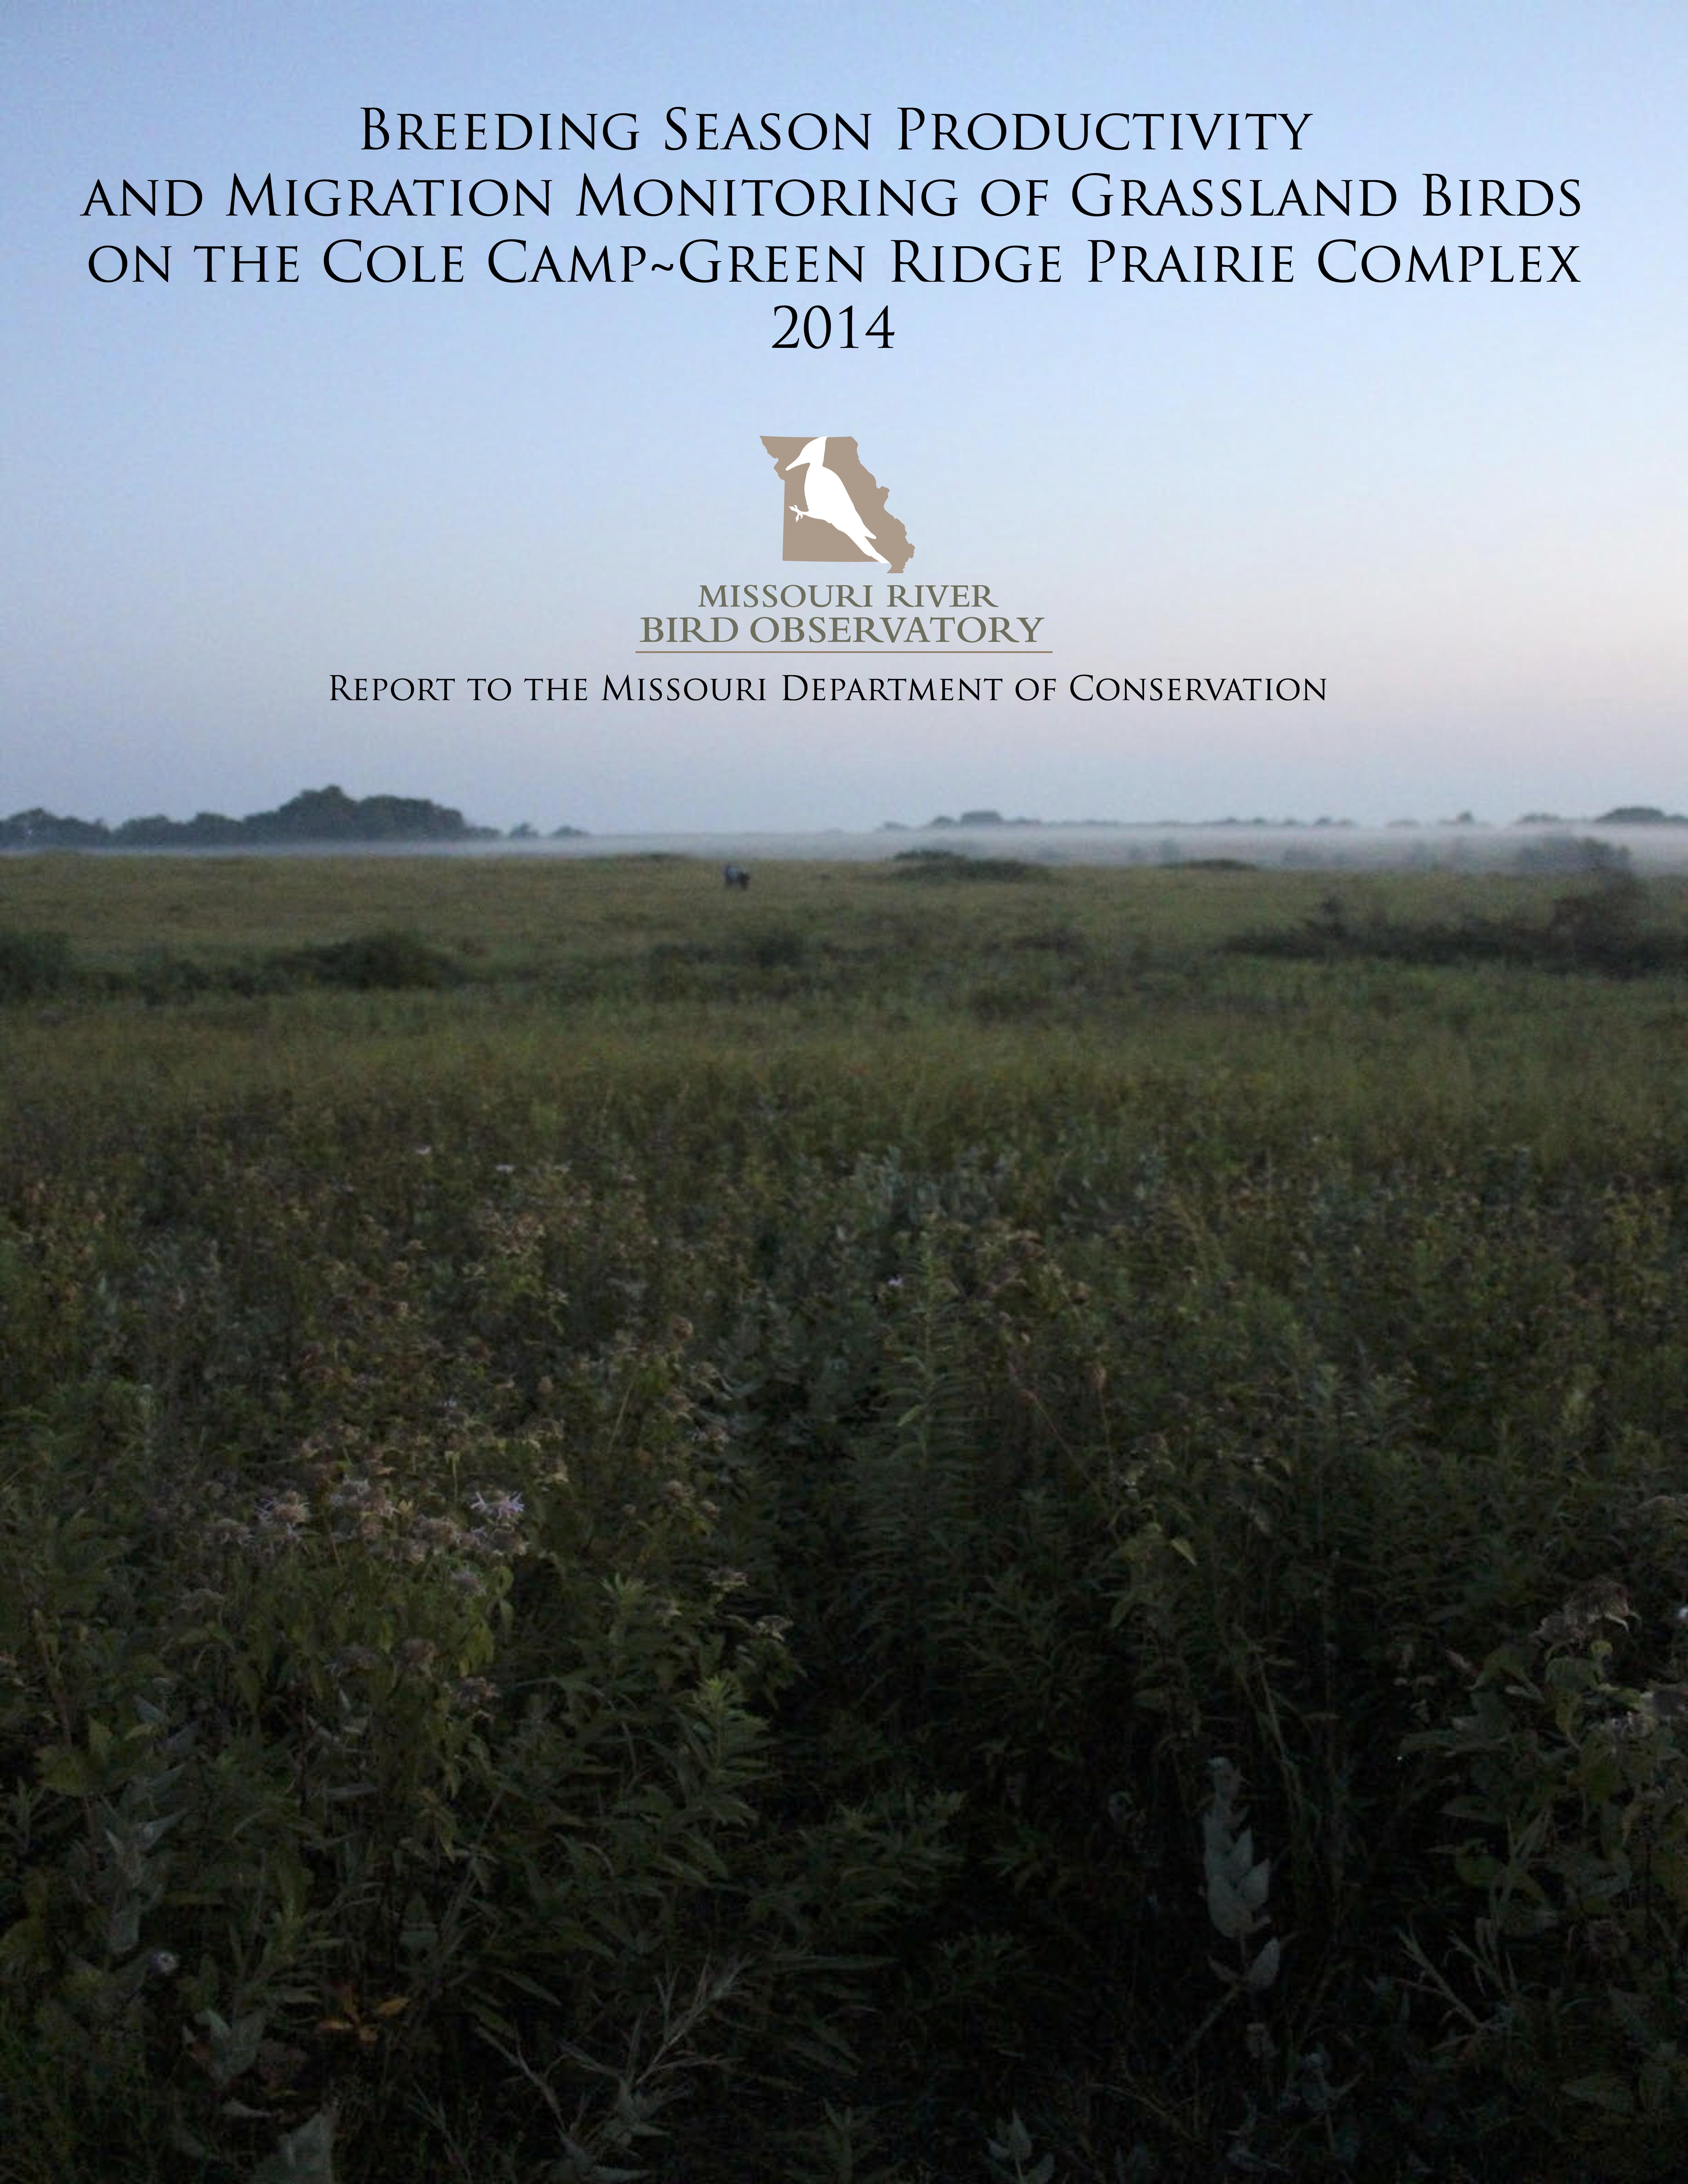 MDC Cole Camp-Green Ridge 2014 Report